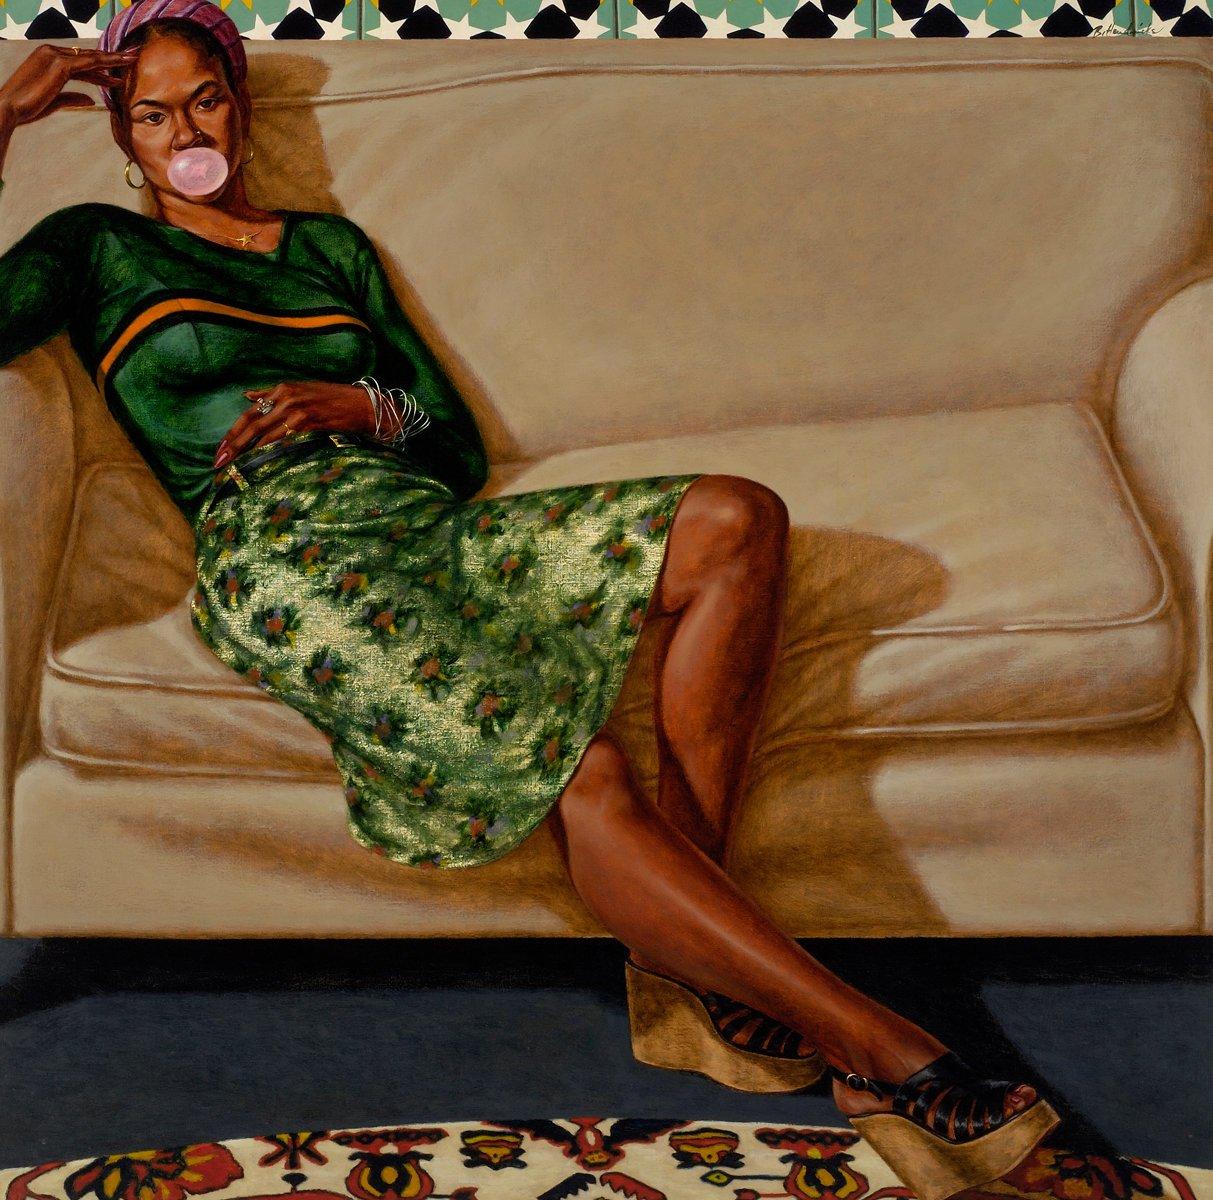 Kerry James Marshall, African American Art, Black Art, African American Artist, Black Artist, Amy Sherald, Race, KOLUMN Magazine, KOLUMN, KINDR'D Magazine, KINDR'D